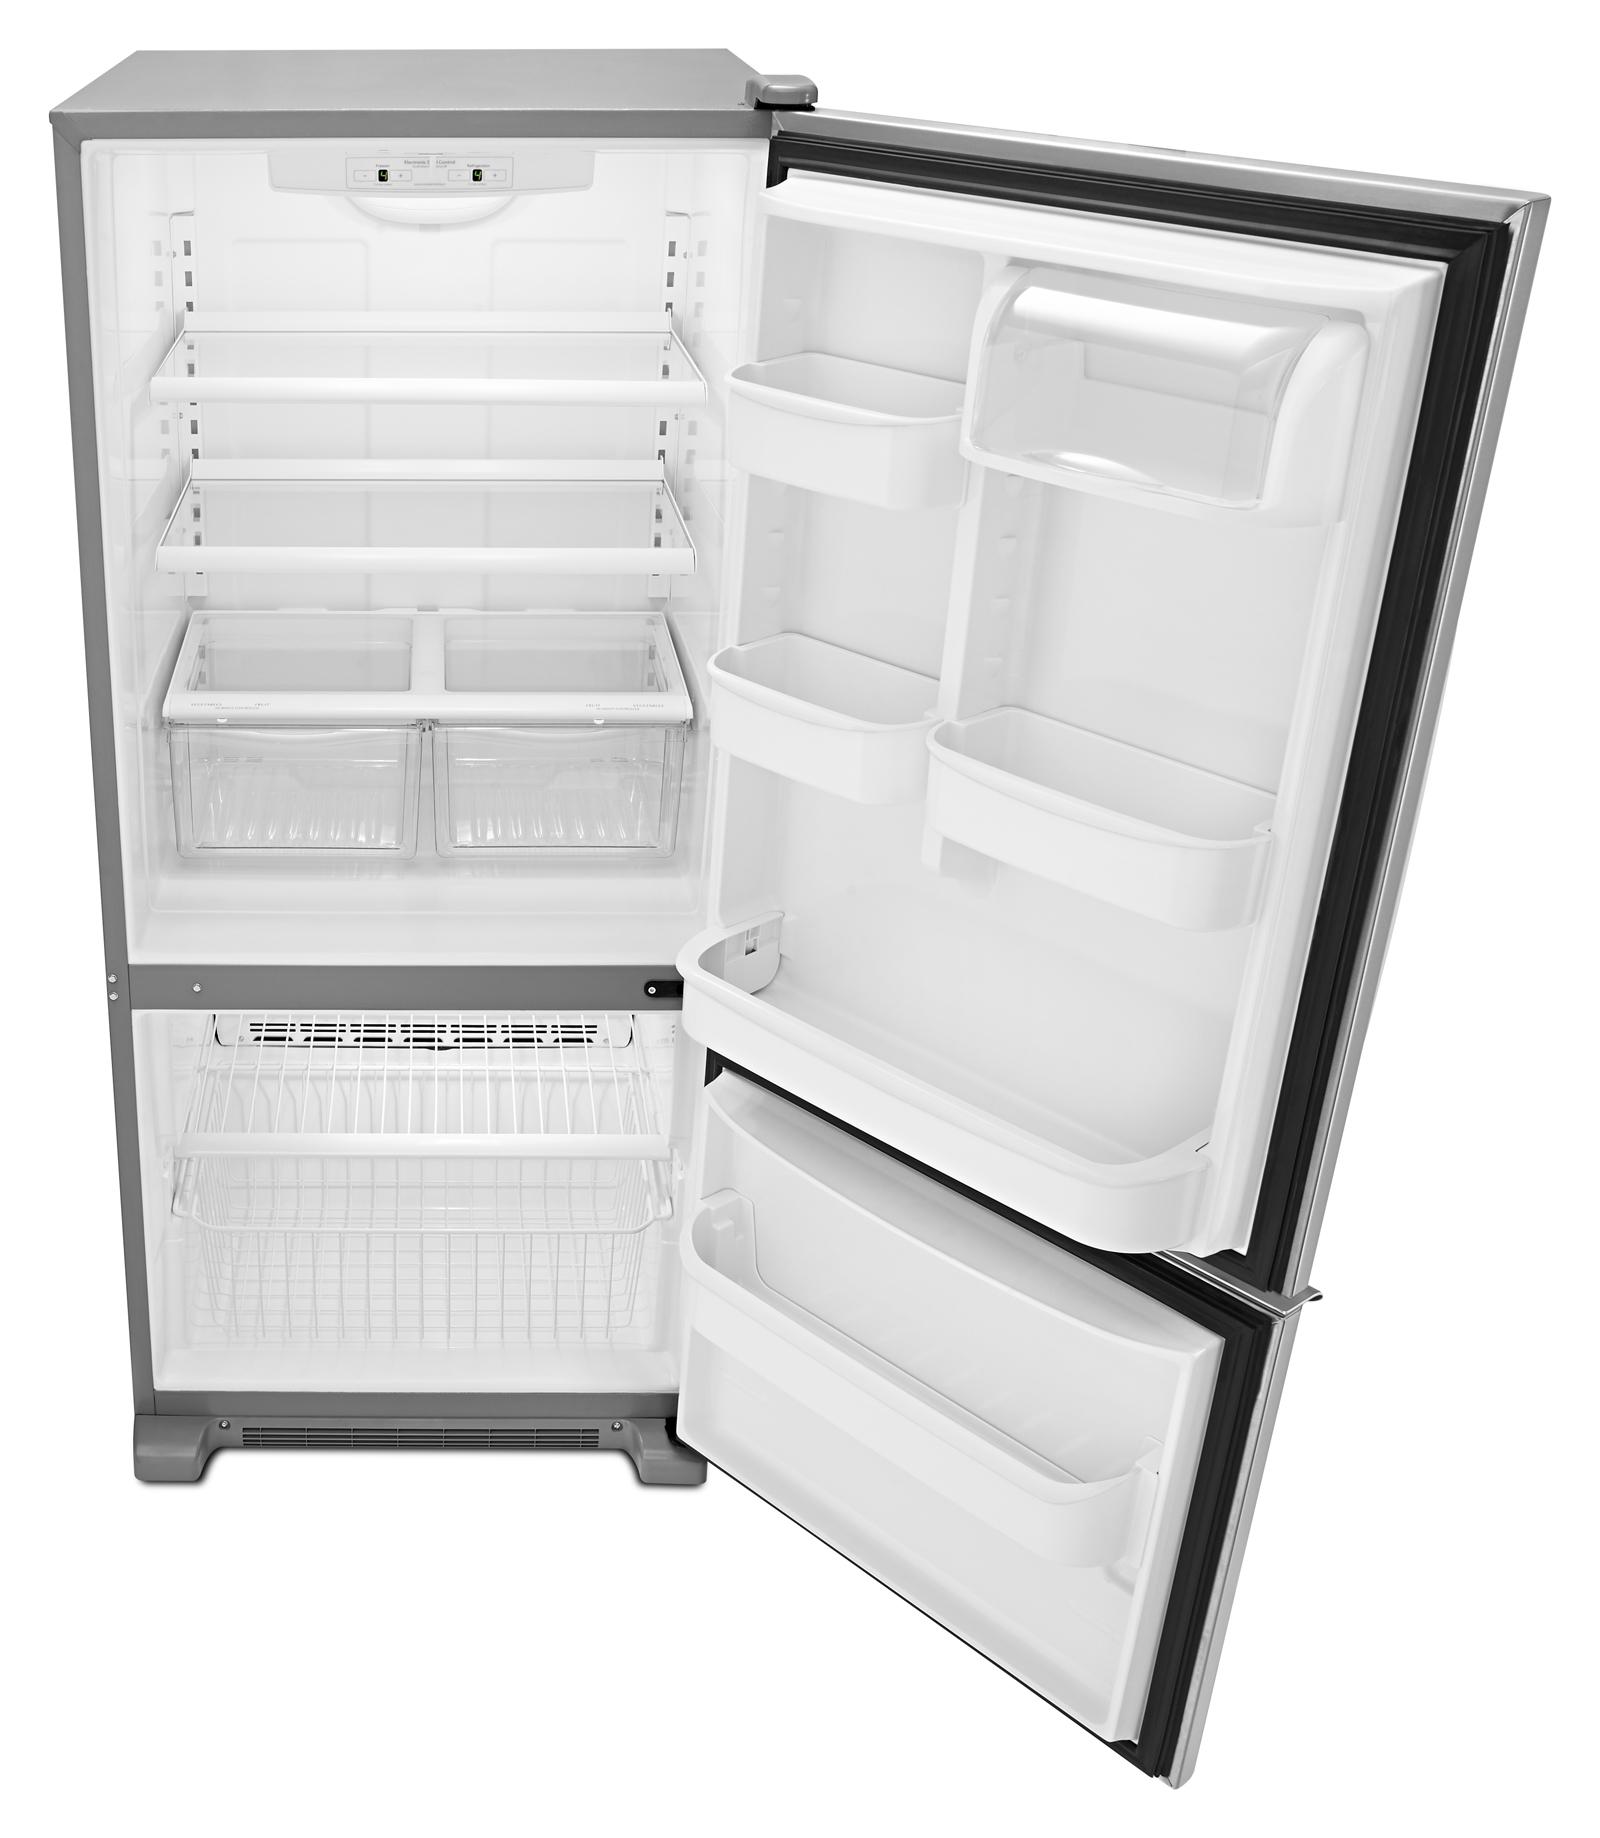 Amana 19 cu. ft. Single-Door Bottom Freezer Refrigerator - Stainless Steel ABB1921BRM